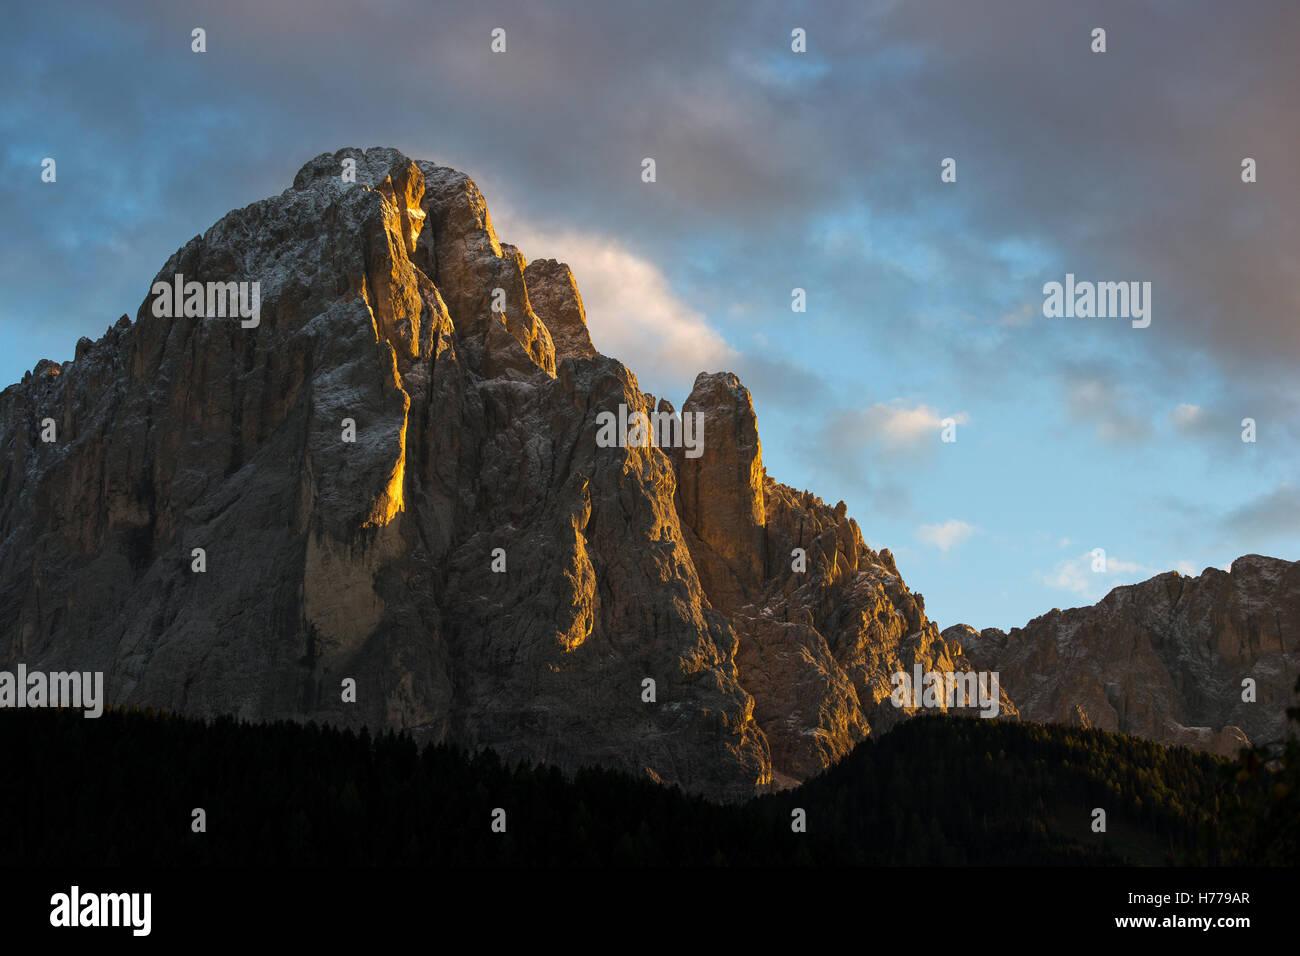 Dolomite mountains at sunset, Val Gardena, South Tyrol, Italy Stock Photo